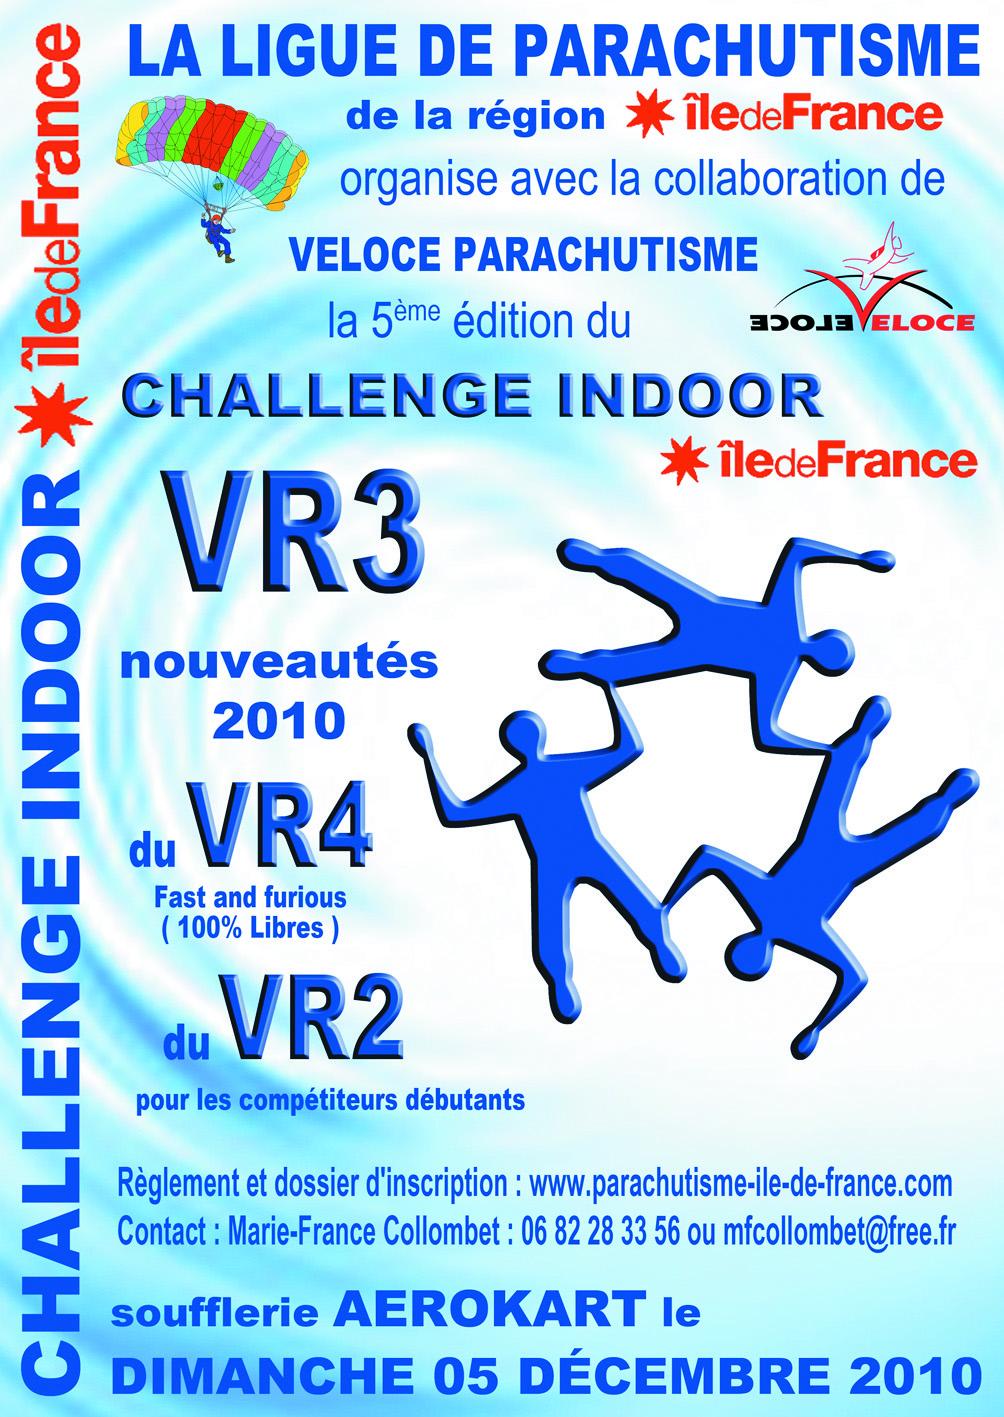 Challenge Indoor VR3 Ile de France 2010